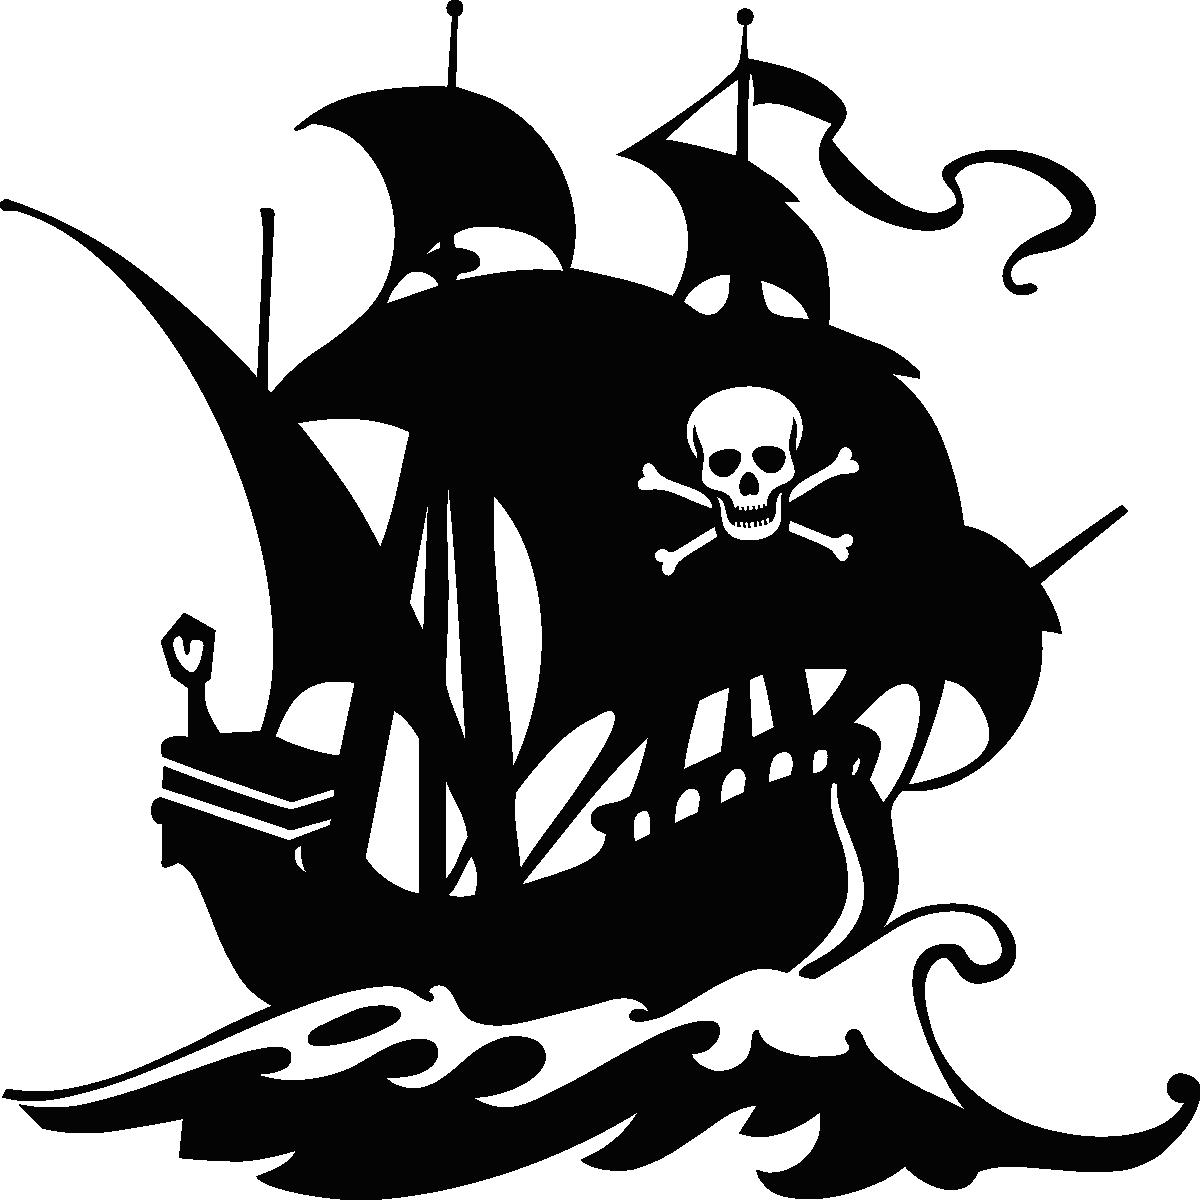 stickers muraux pour les enfants sticker navire pirate ambiance. Black Bedroom Furniture Sets. Home Design Ideas